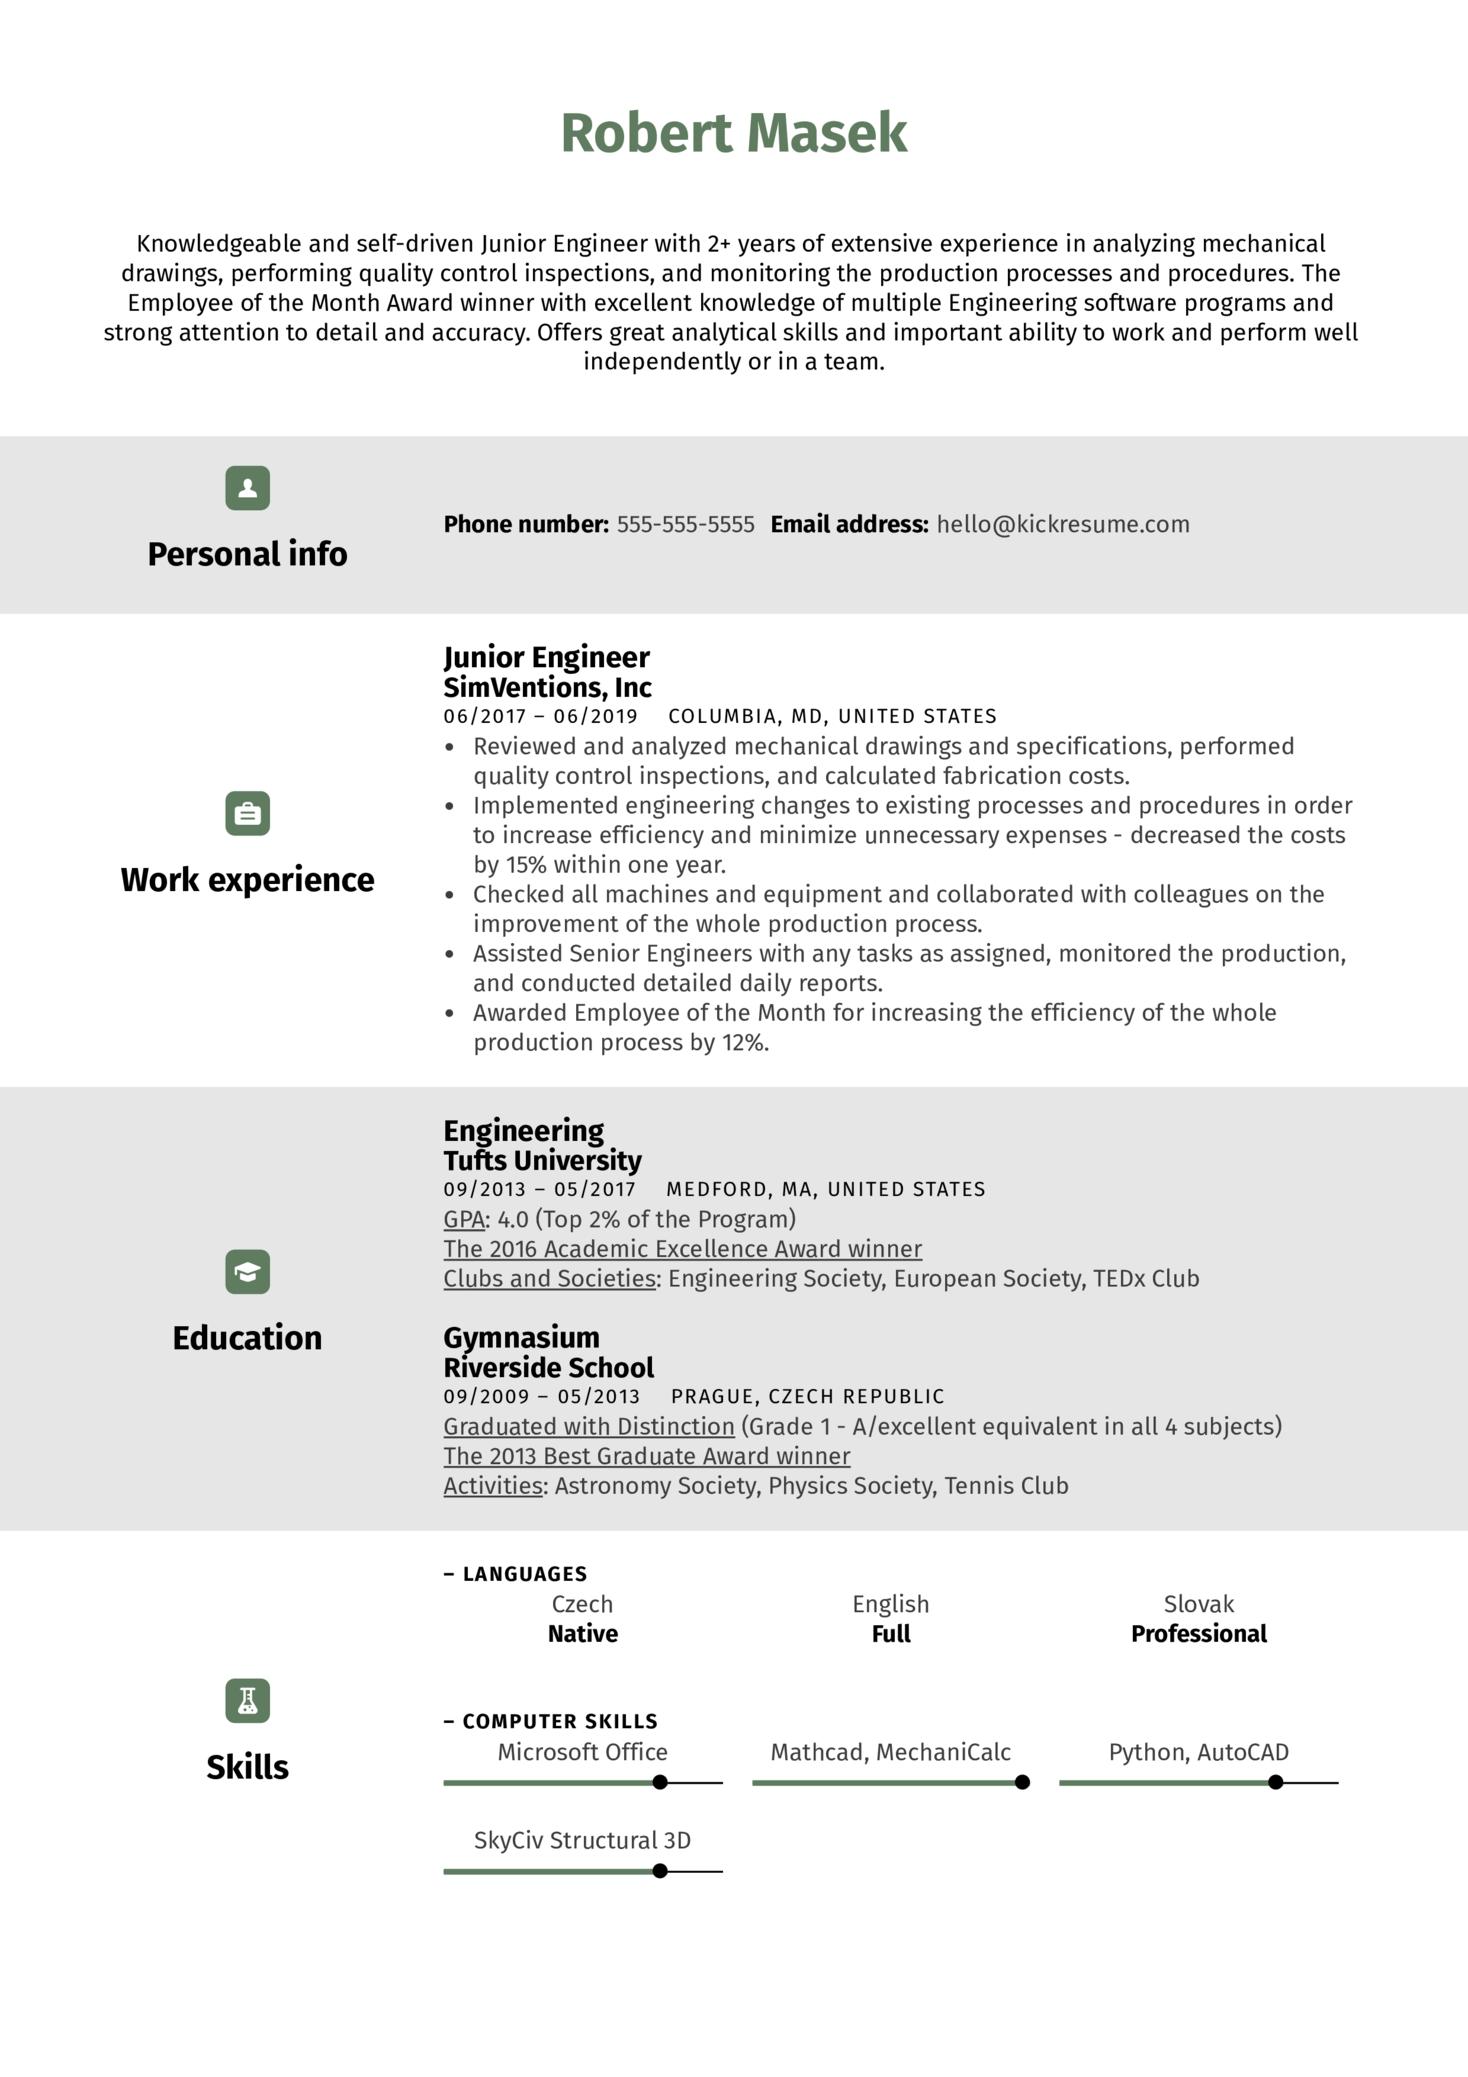 Junior Engineer Resume Sample (Teil 1)